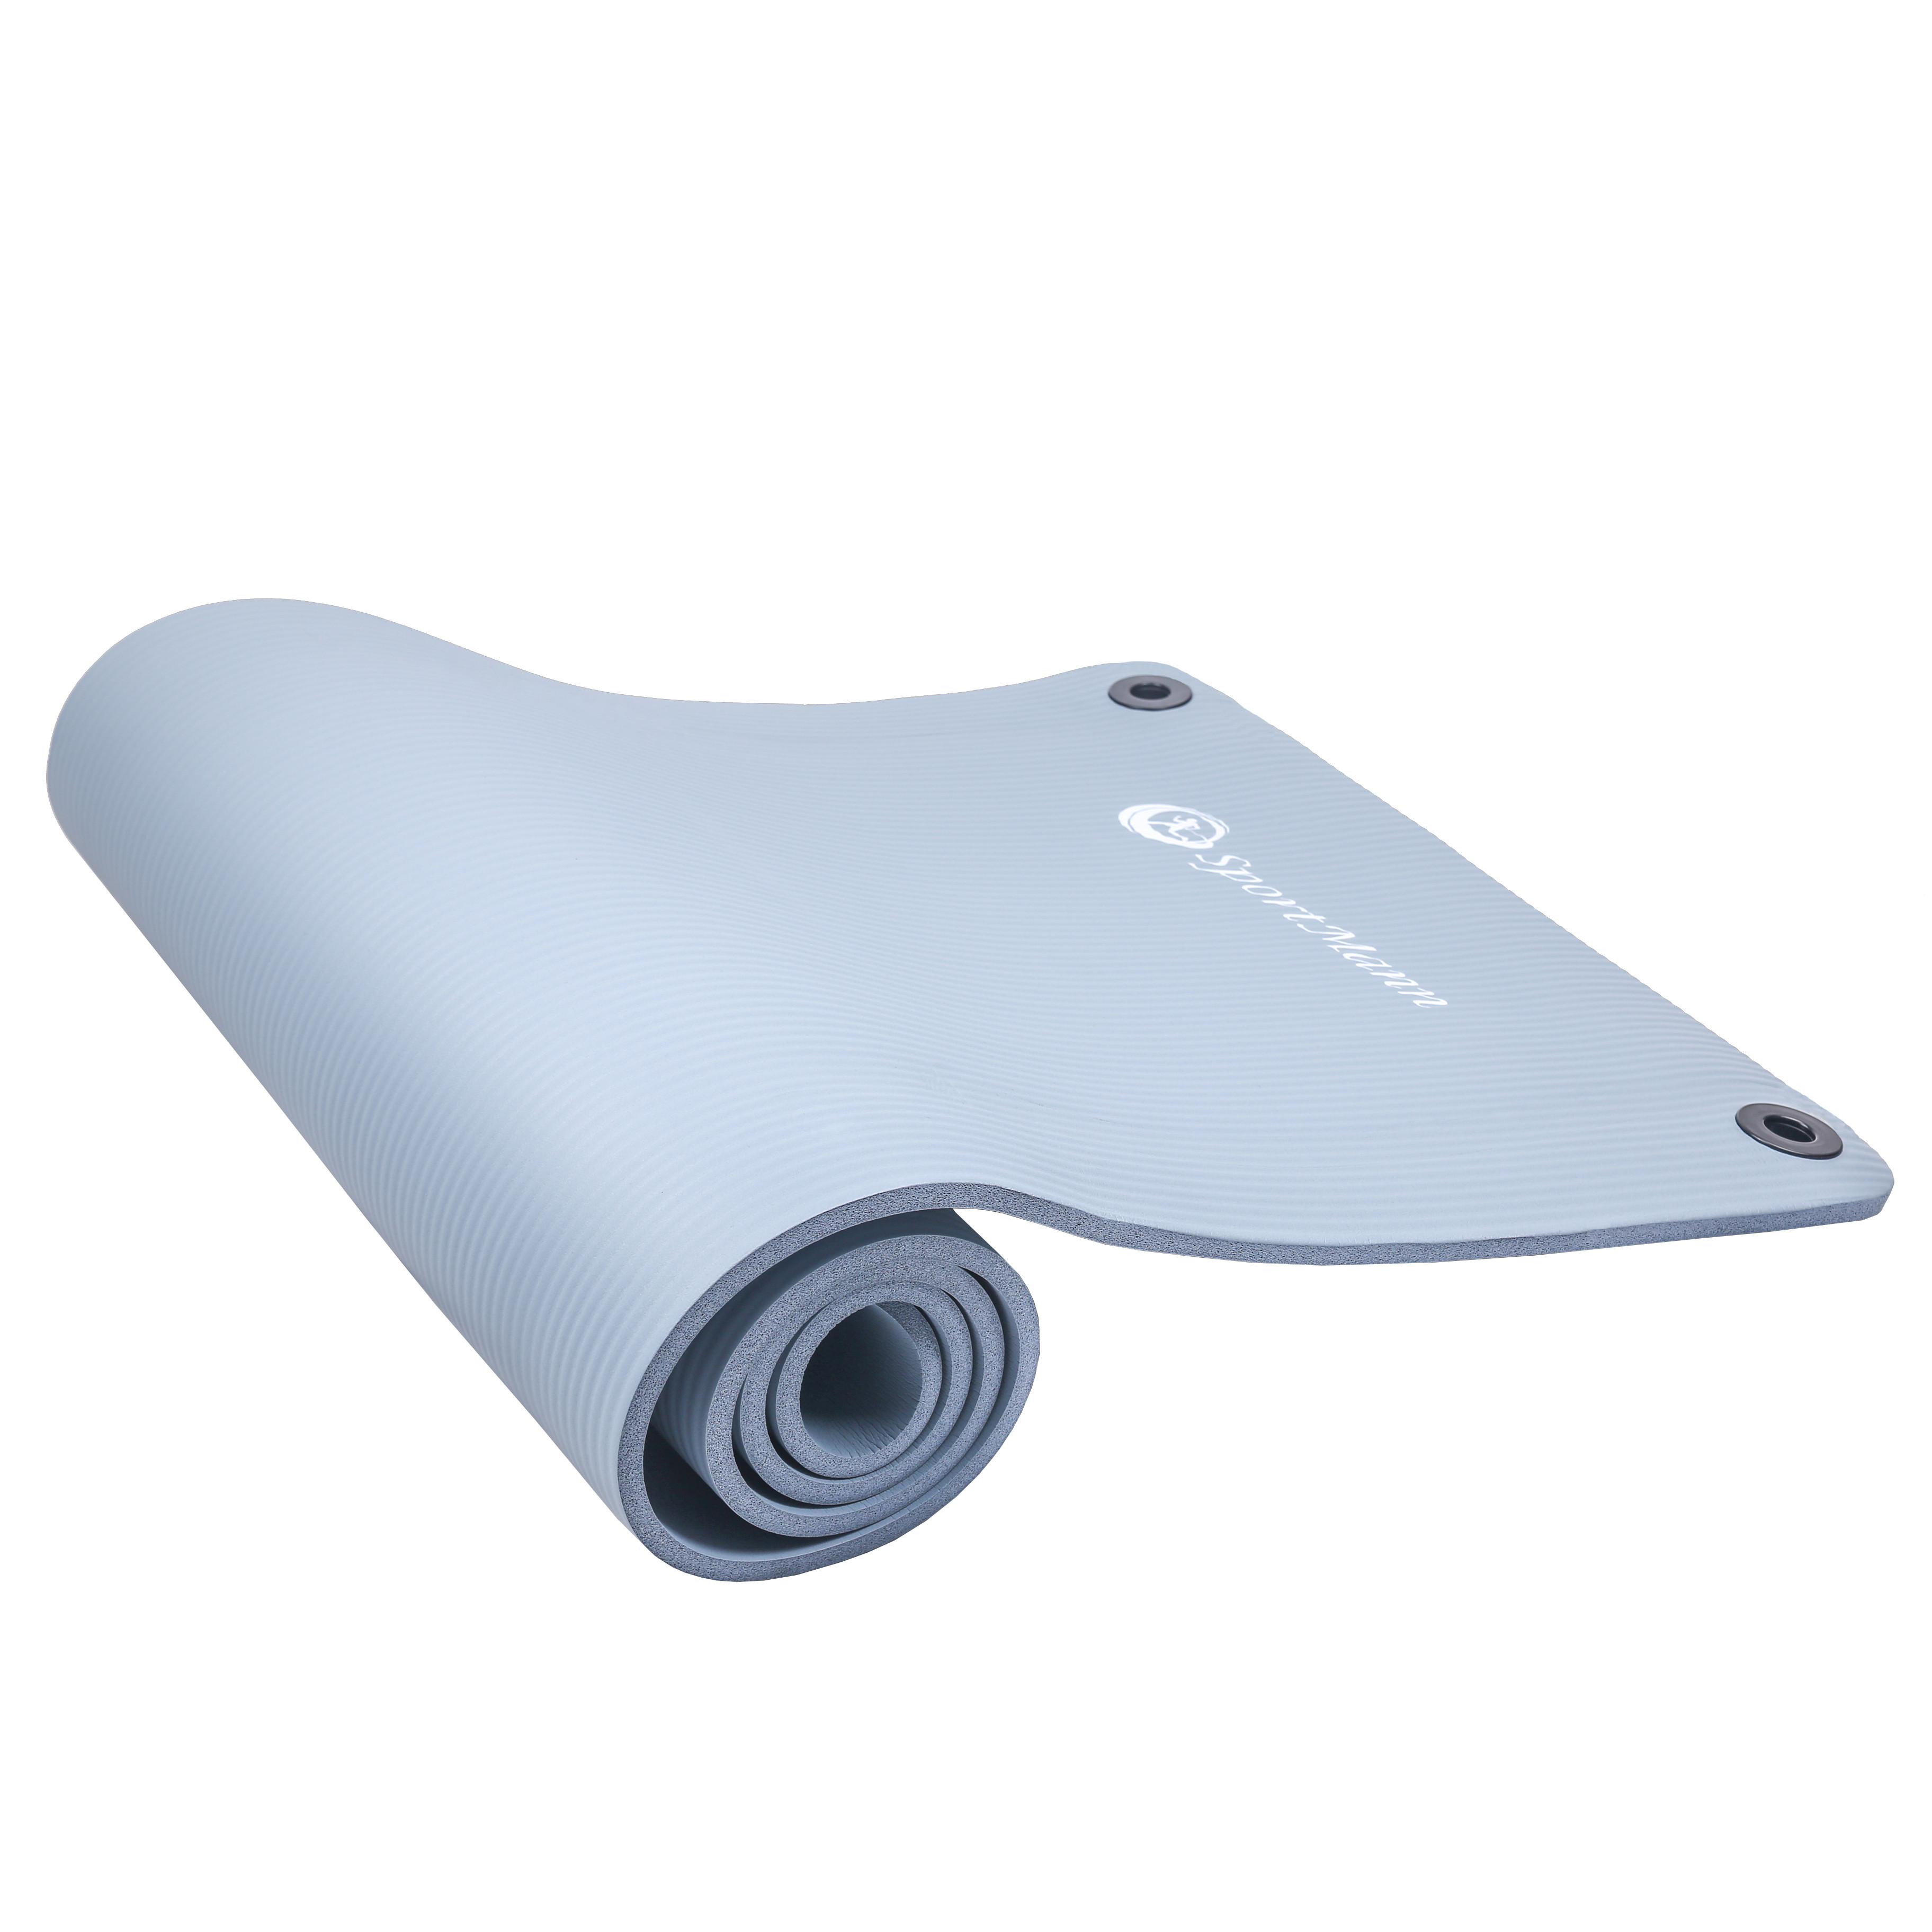 Saltea exercitii fitness Profi, 180x60x1.5cm, rosu, Sportmann